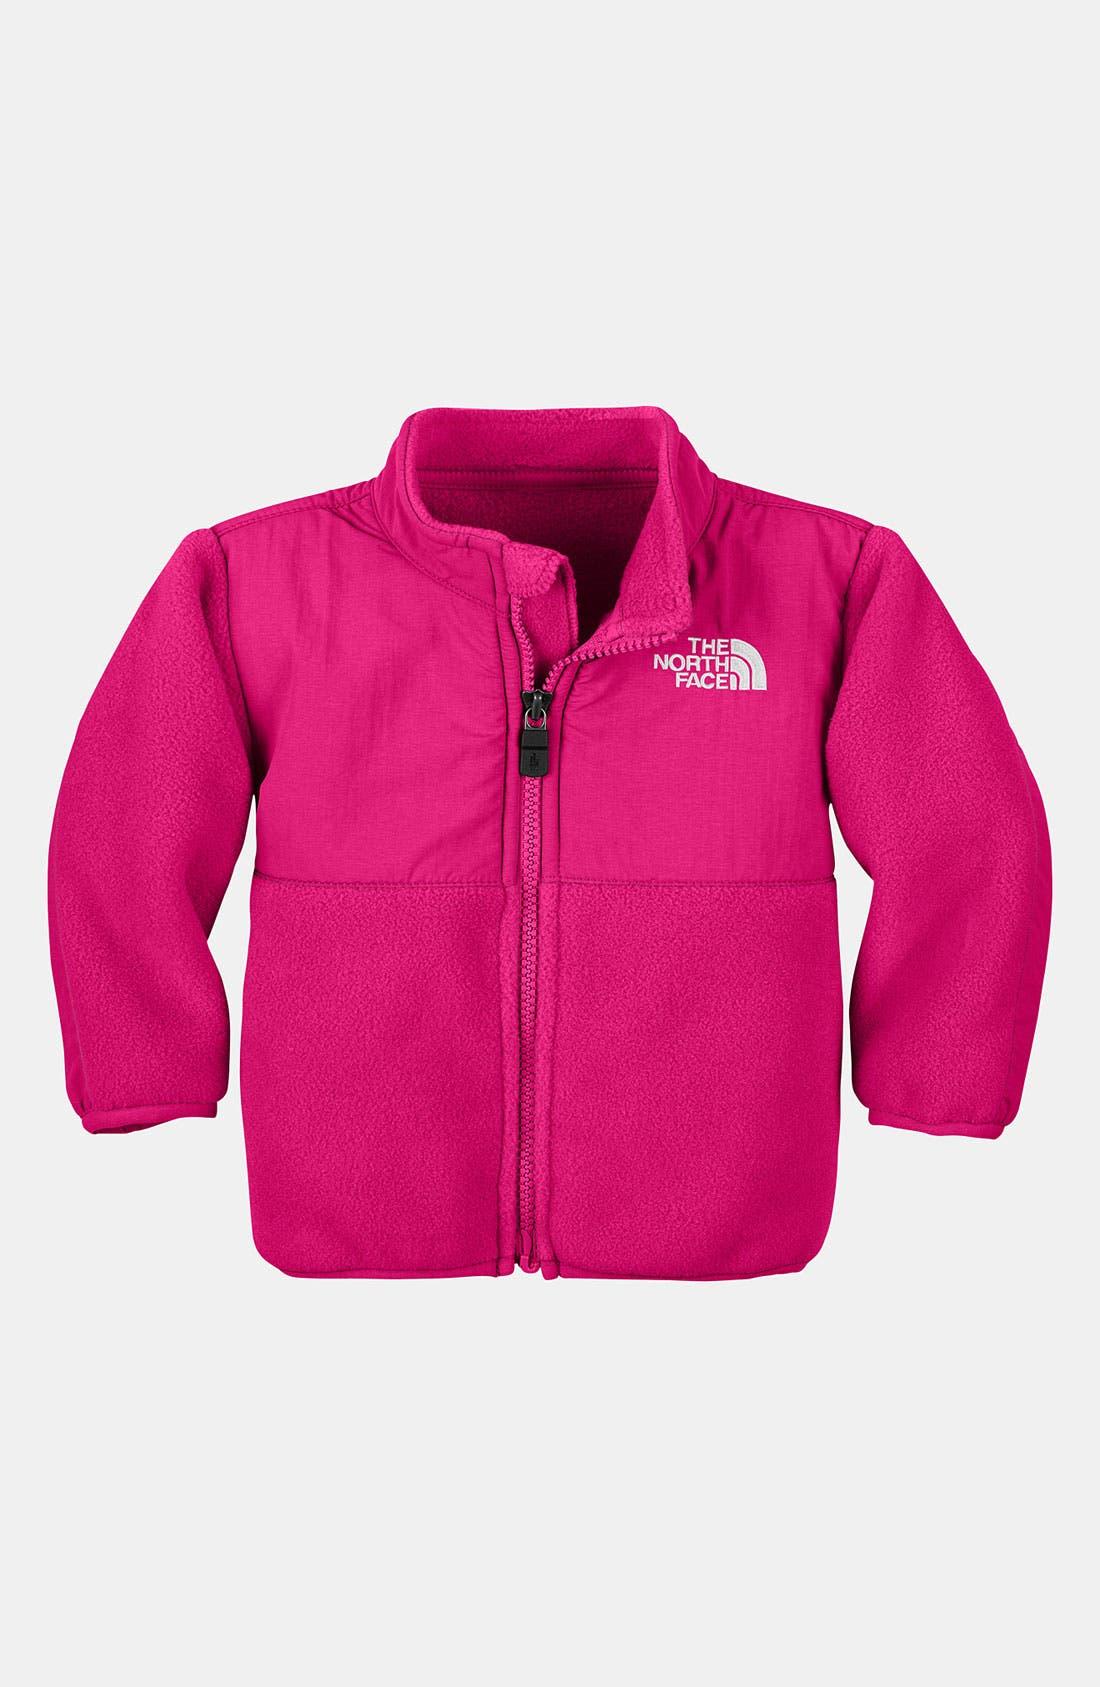 Main Image - The North Face 'Denali' Jacket (Infant)